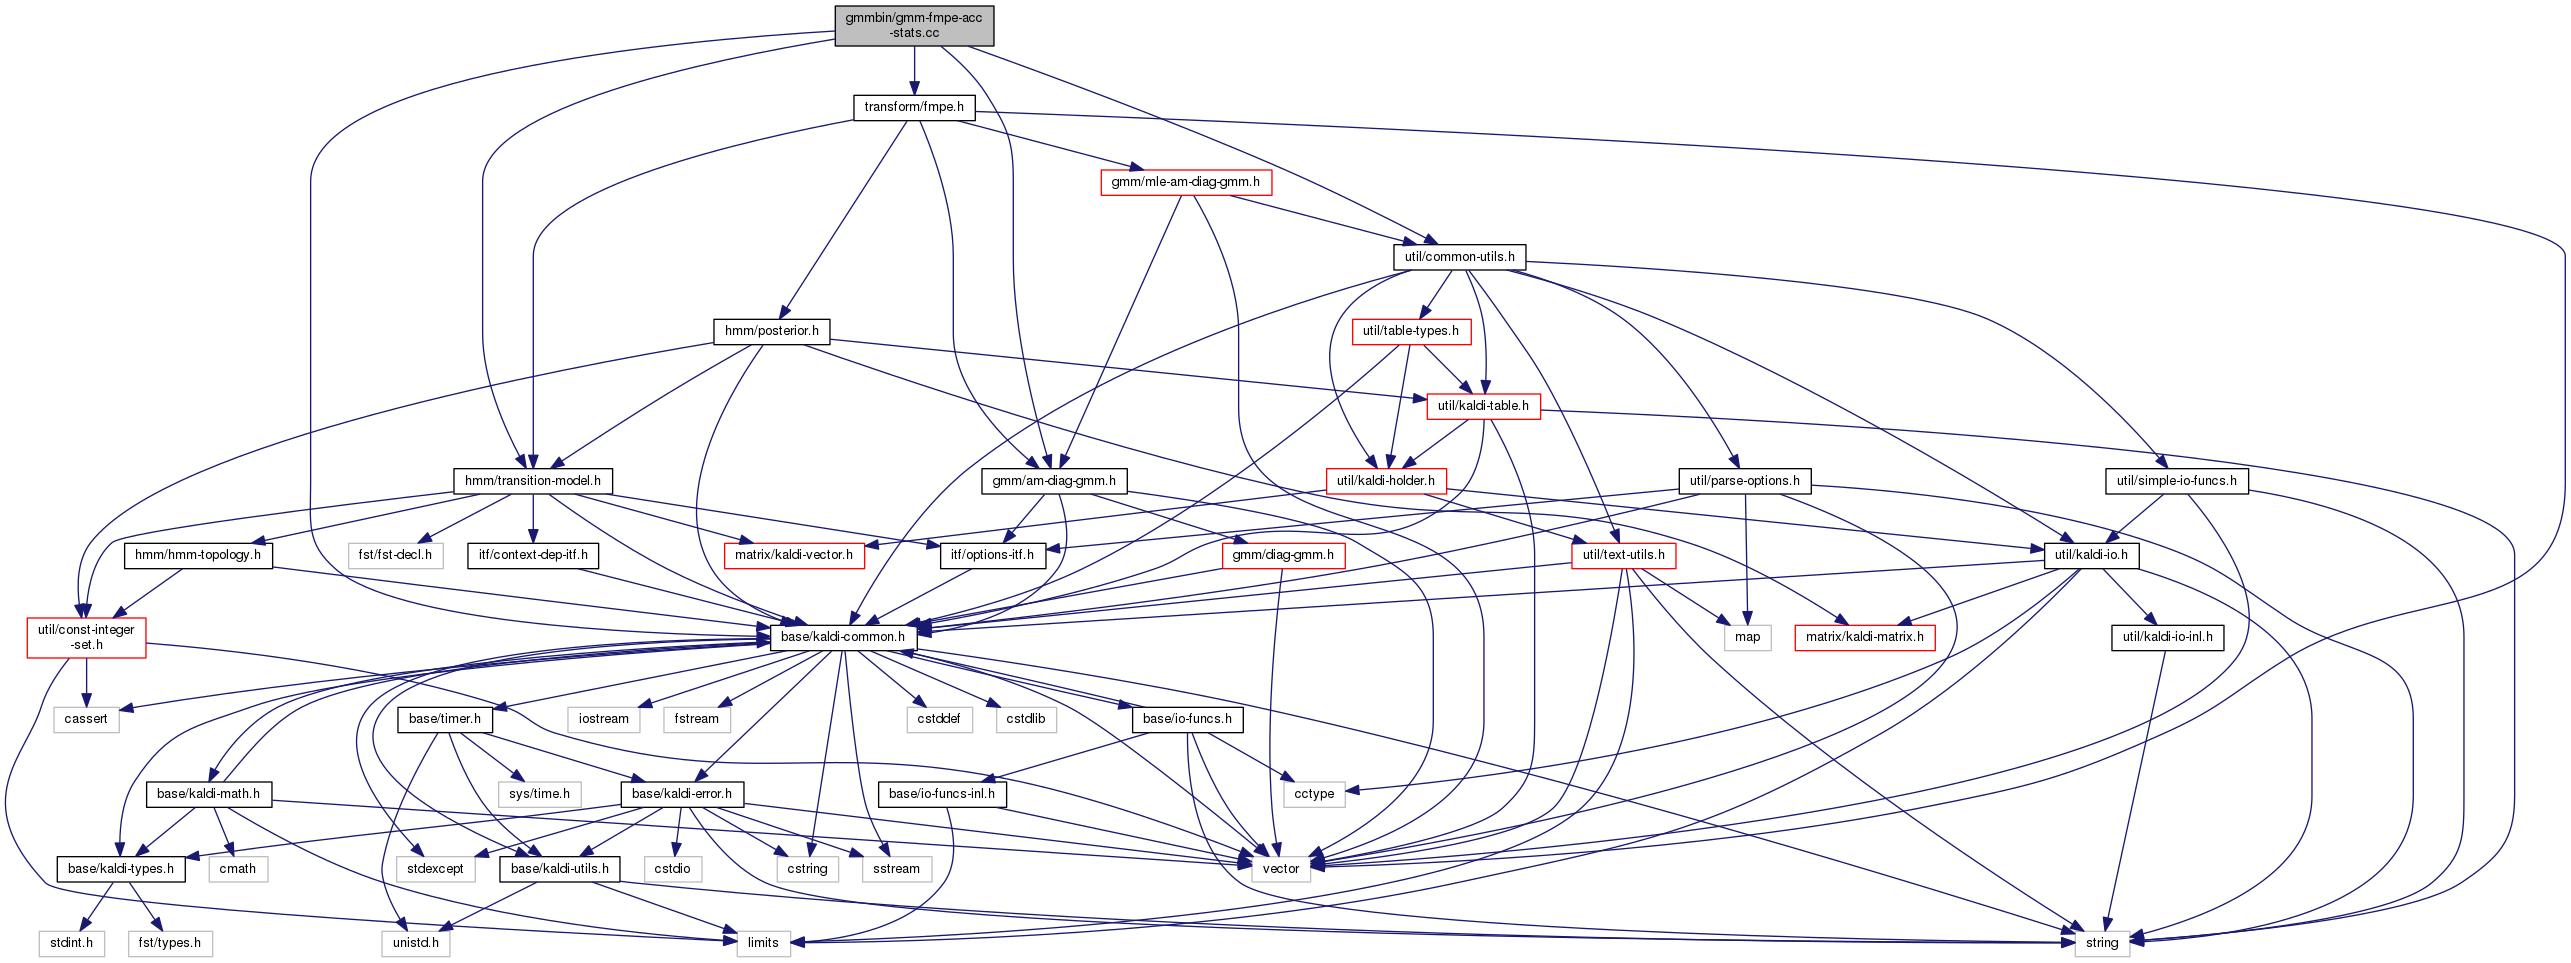 Kaldi: gmmbin/gmm-fmpe-acc-stats cc File Reference